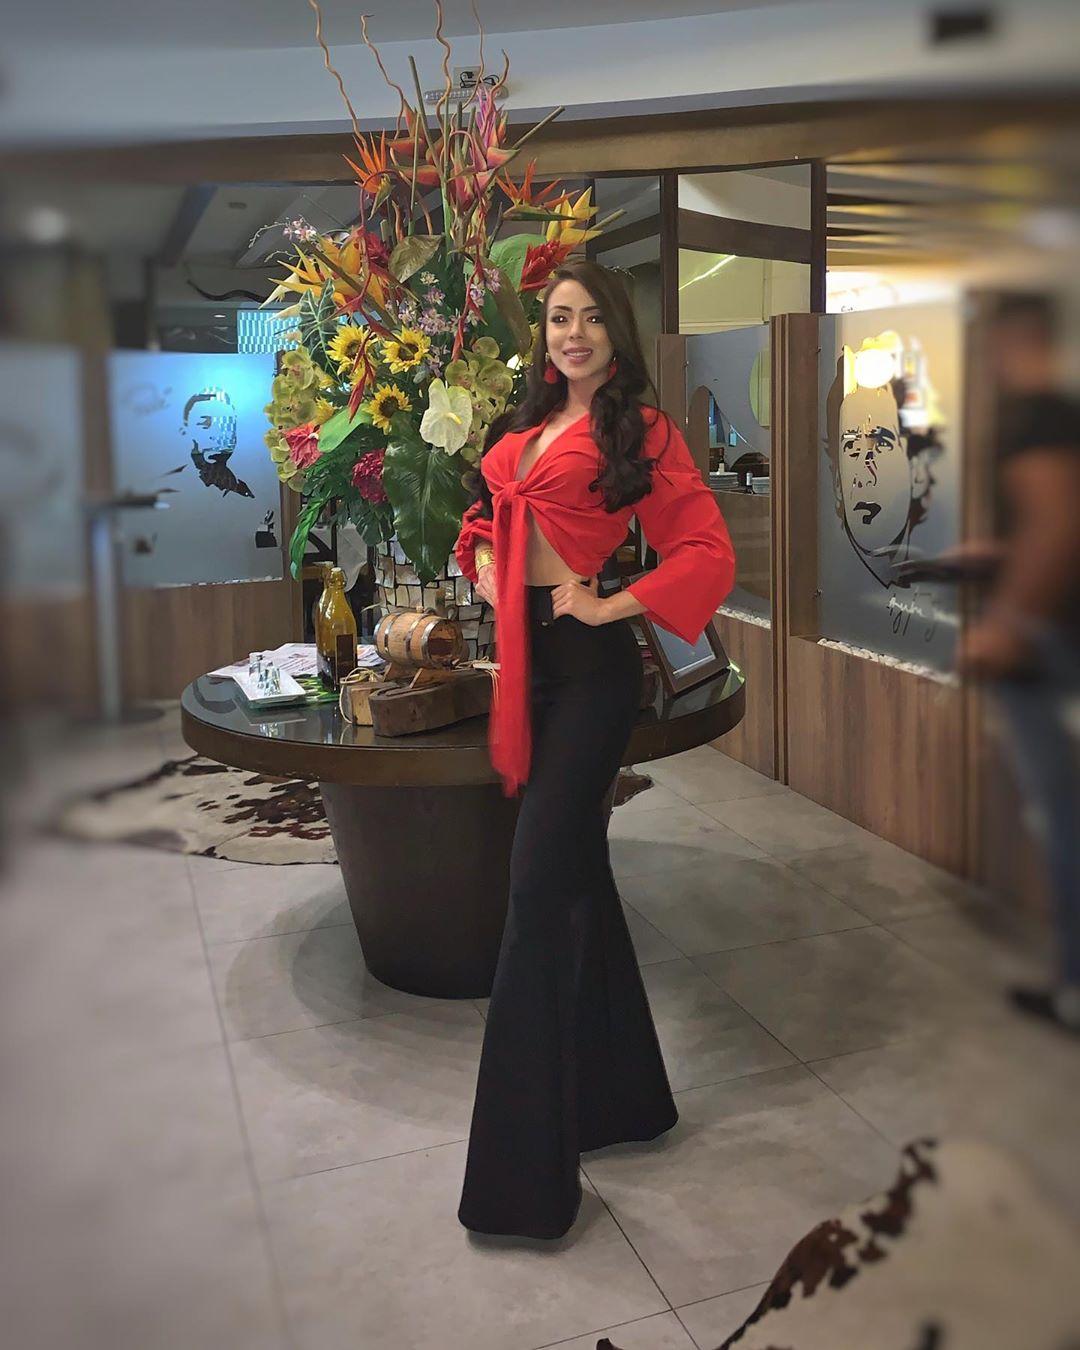 gina aguirre, virreyna de miss latinoamerica 2019. - Página 4 69731910